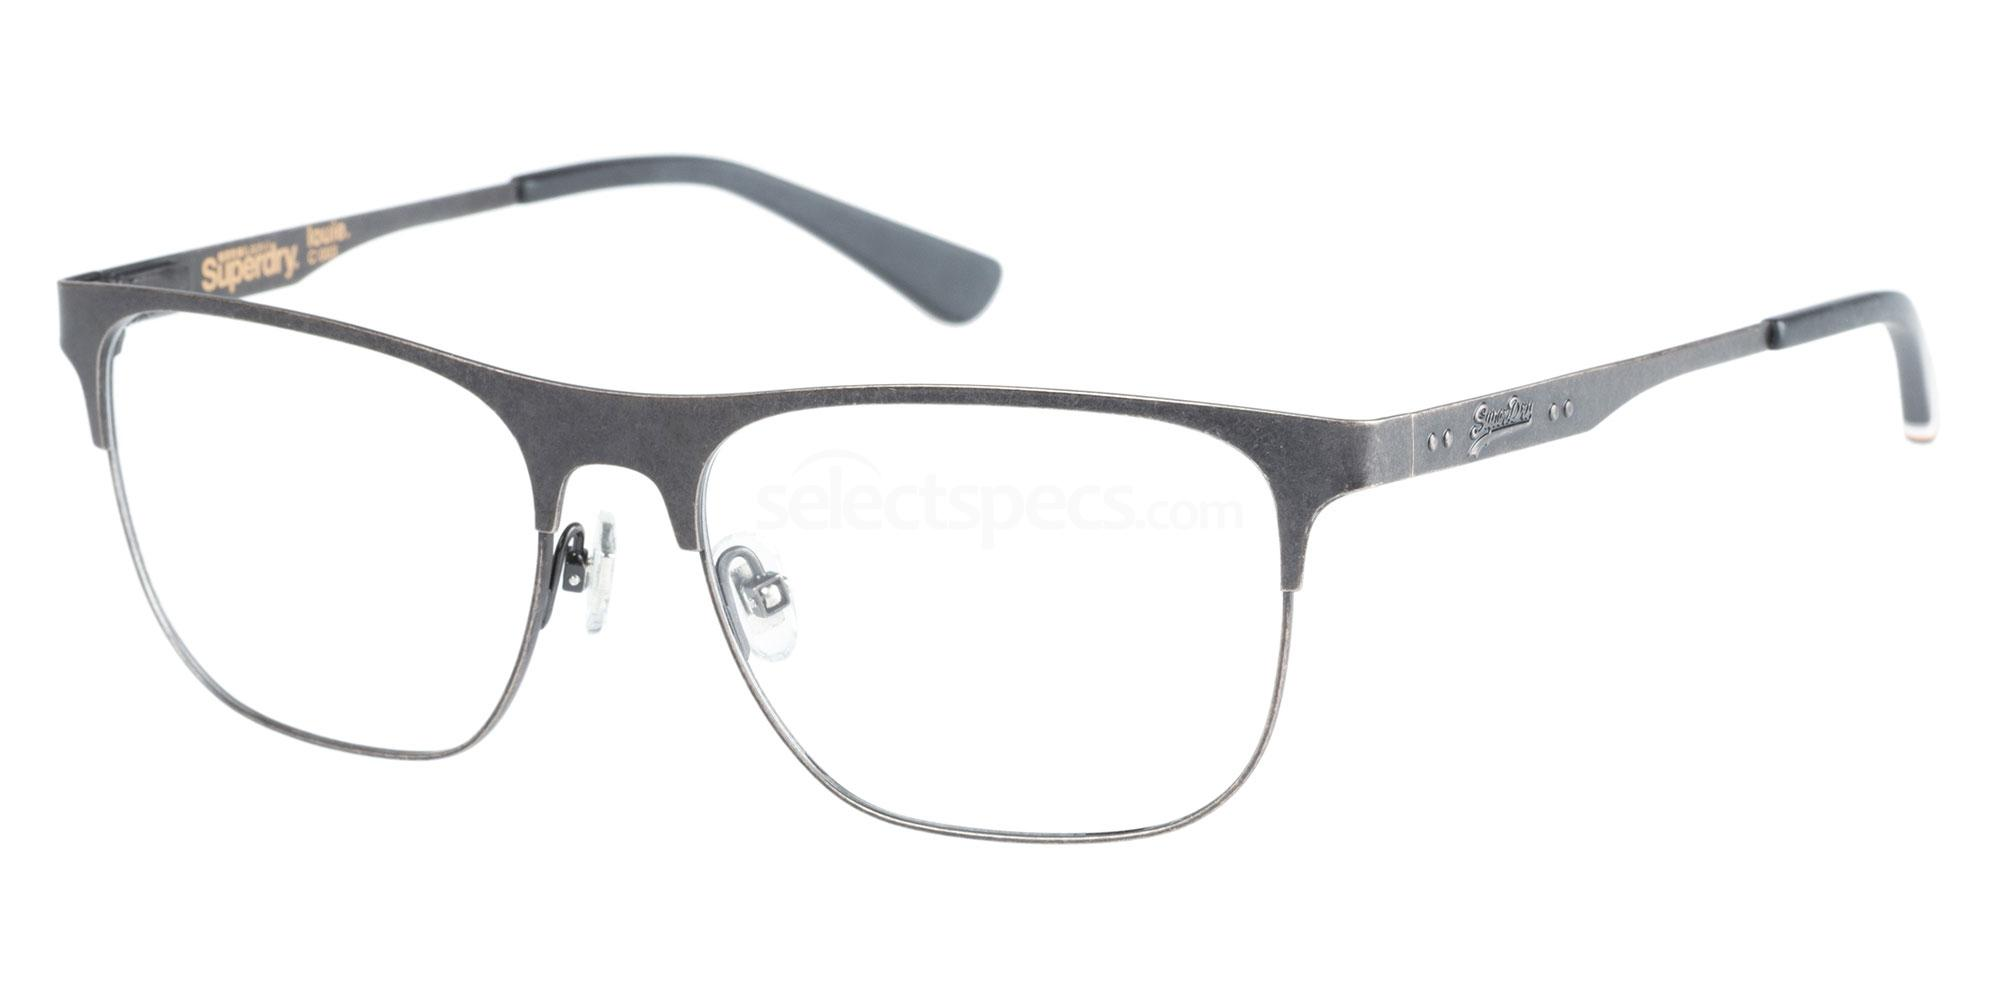 003 SDO-LOUIE Glasses, Superdry